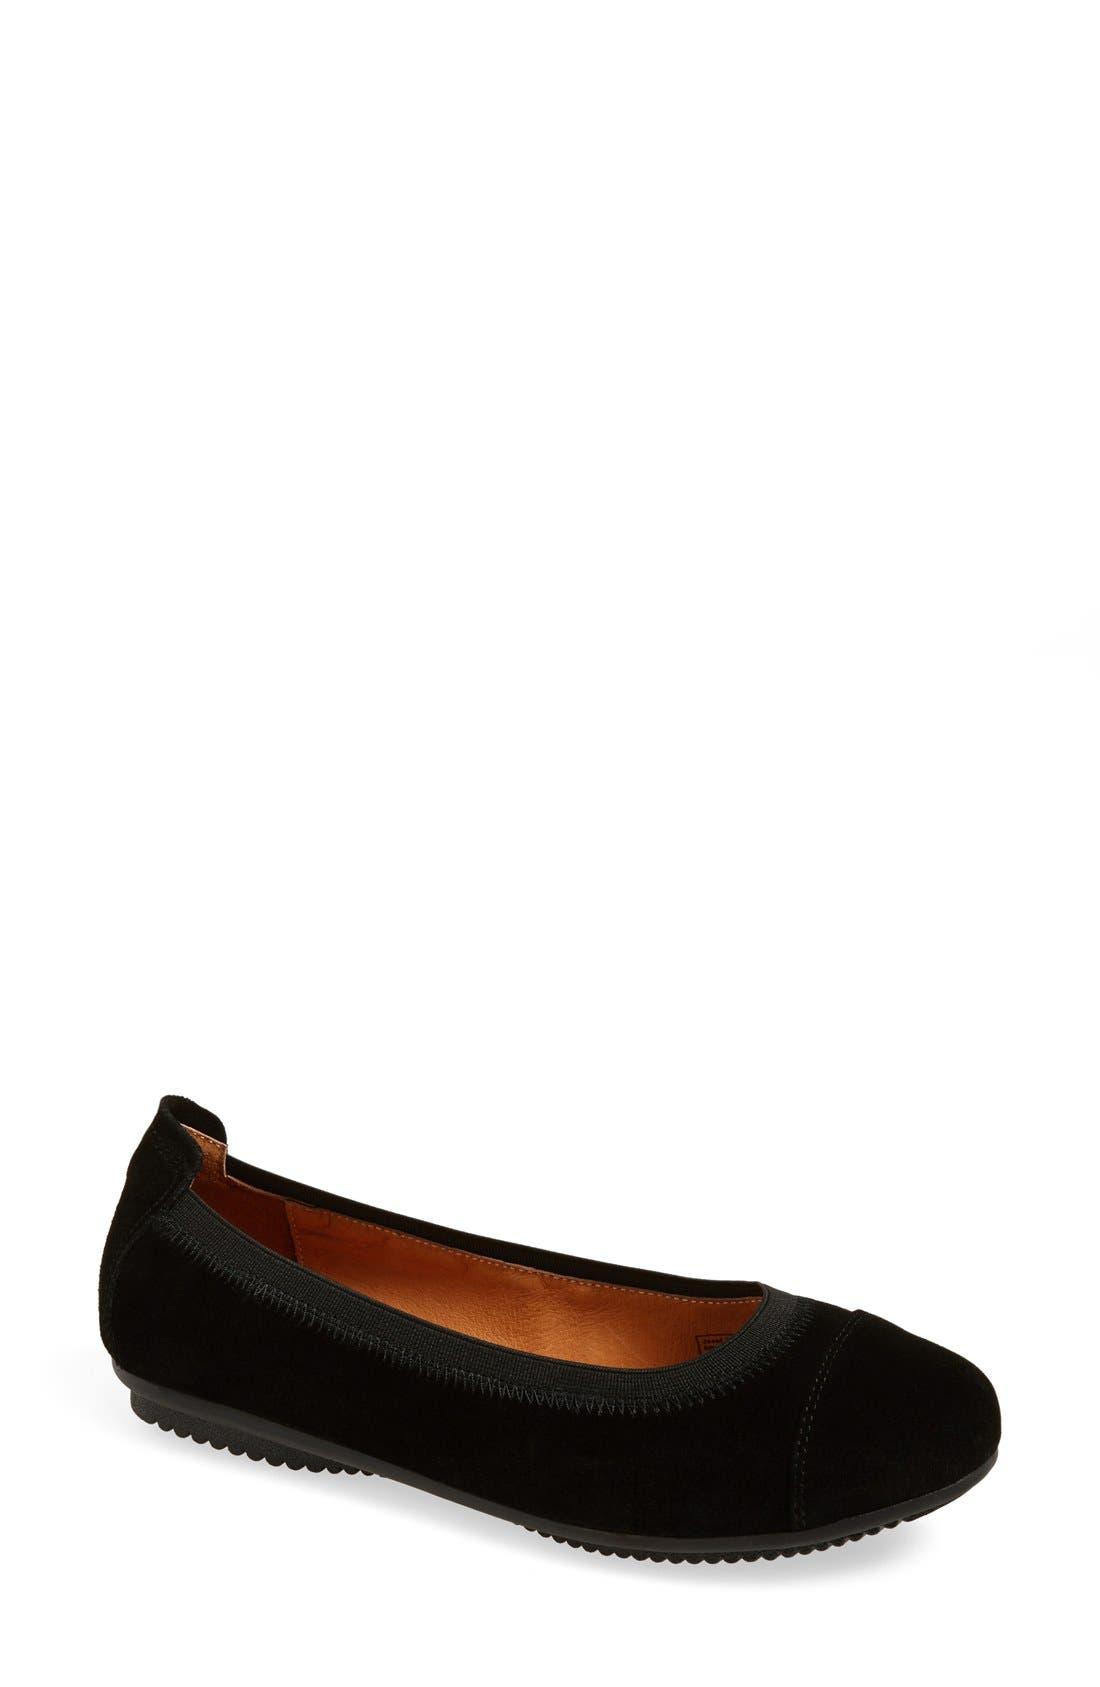 Pippa 07 Flat,                         Main,                         color, Black Suede